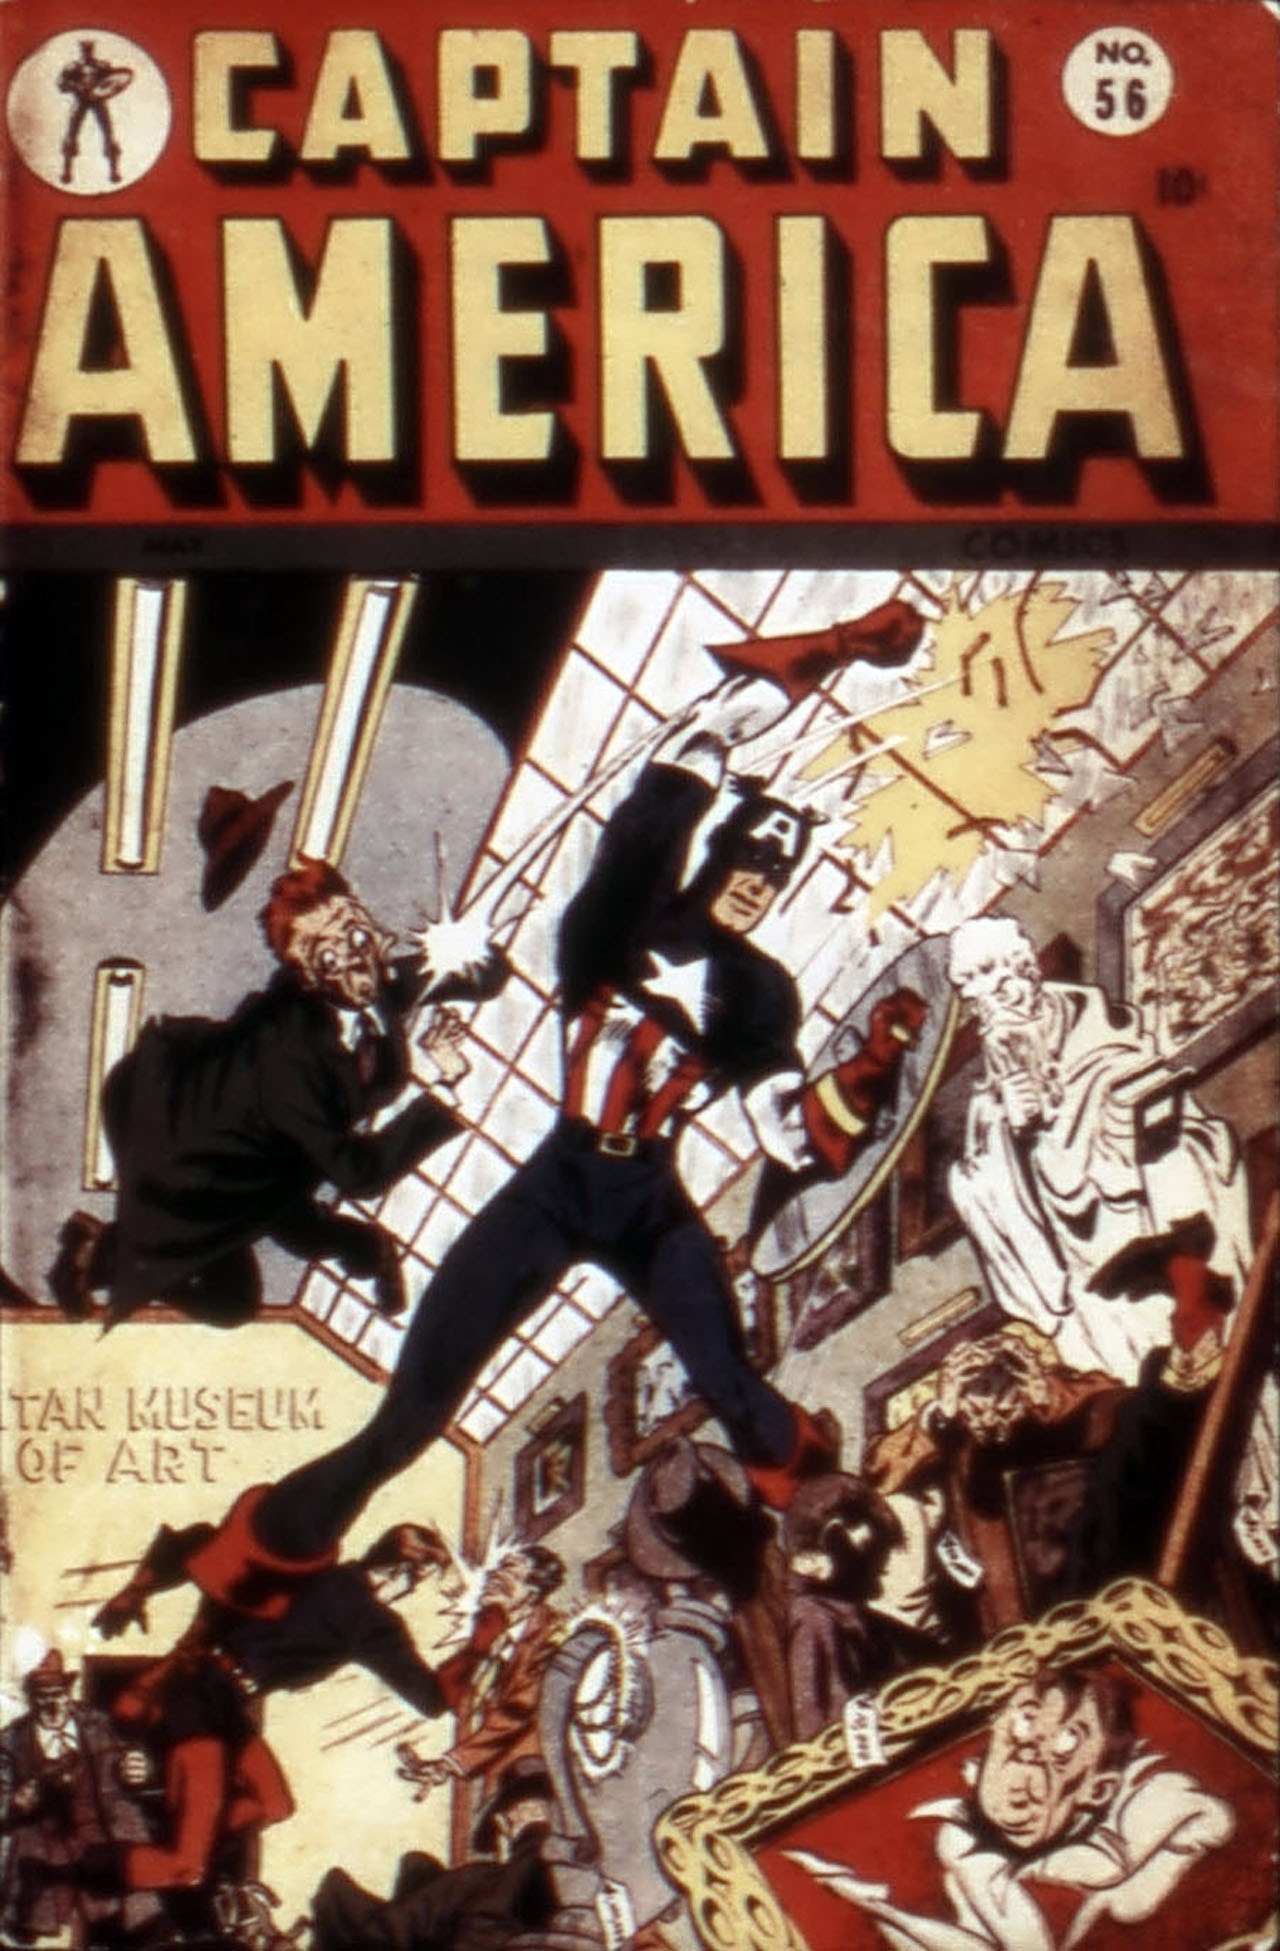 Captain America Comics 56 Page 1